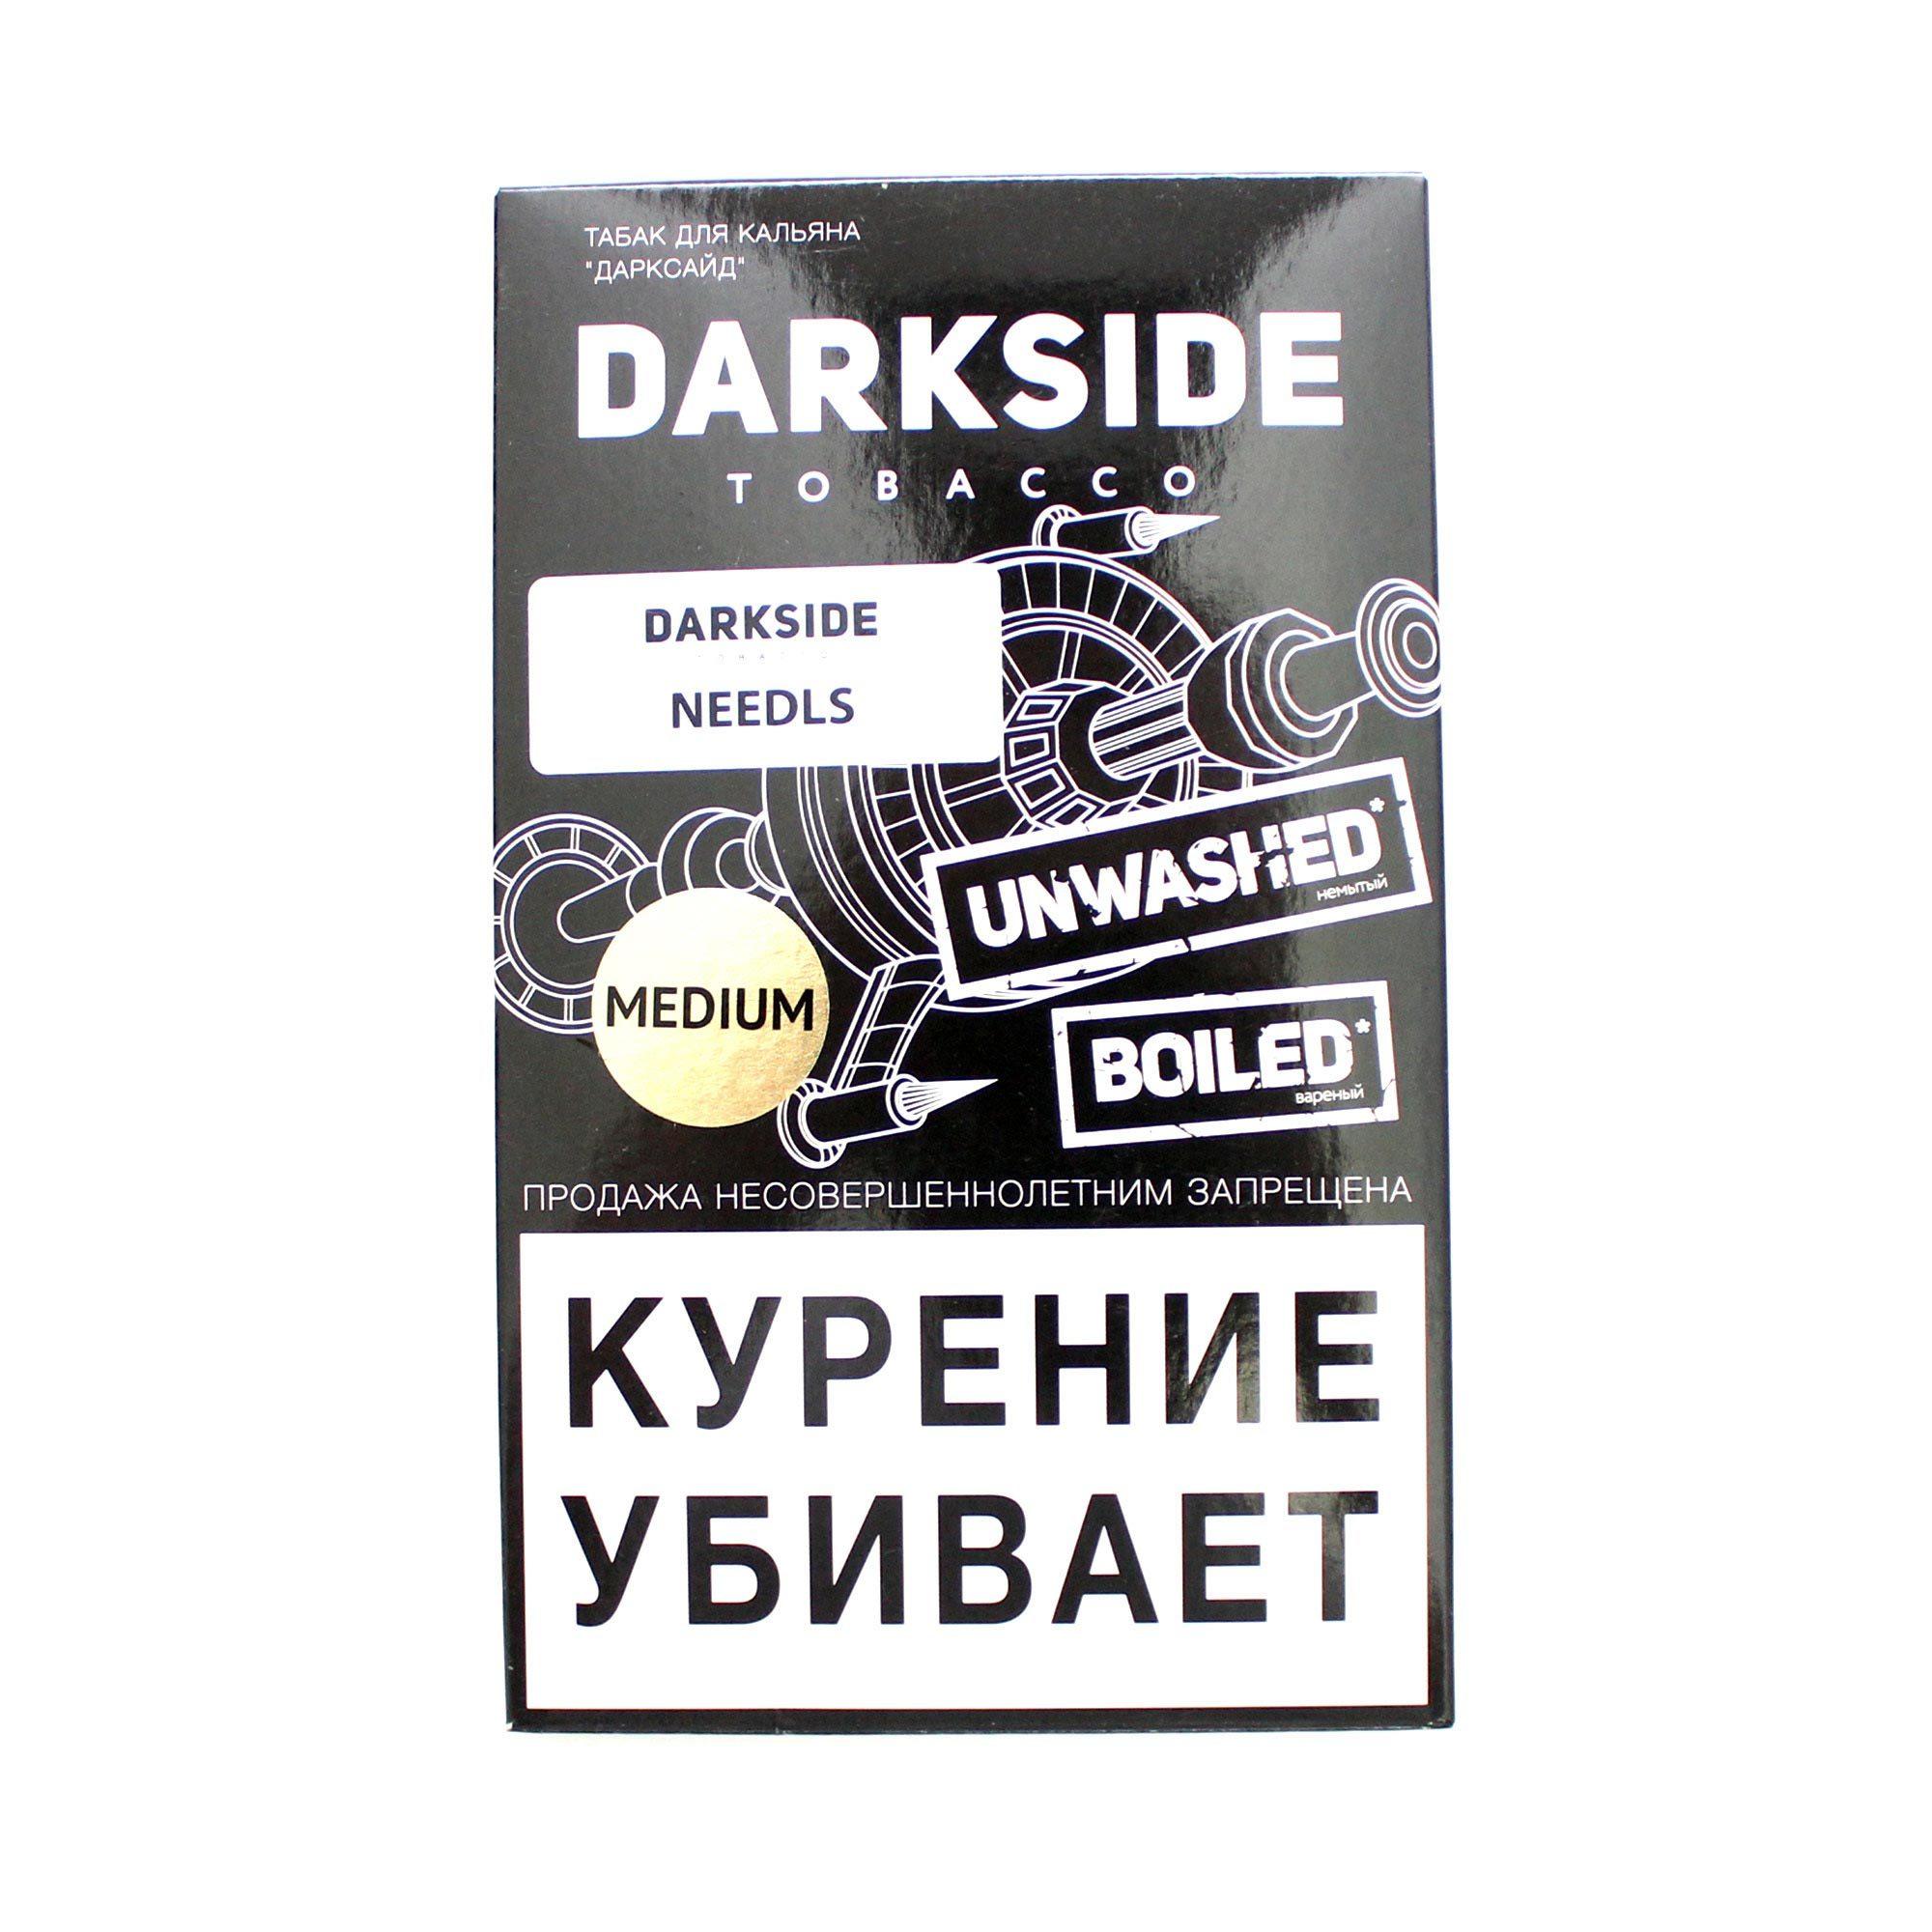 Табак для кальяна Dark Side Medium 100 гр. Needls